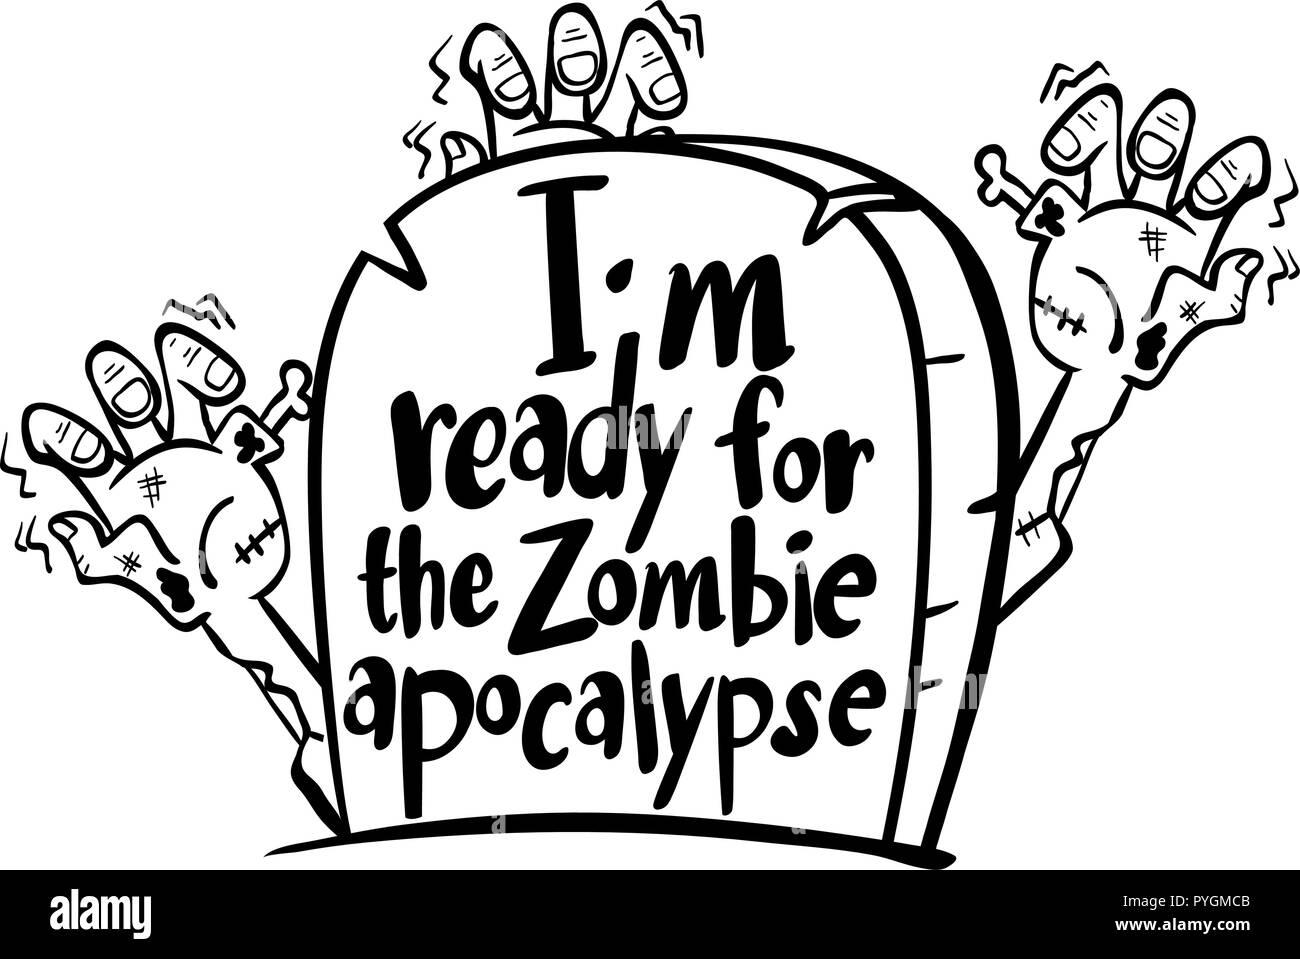 zombie apocalypse stock photos zombie apocalypse stock images alamy JBL vs Undertaker english expression for ready for zombie apocalypse illustration stock image